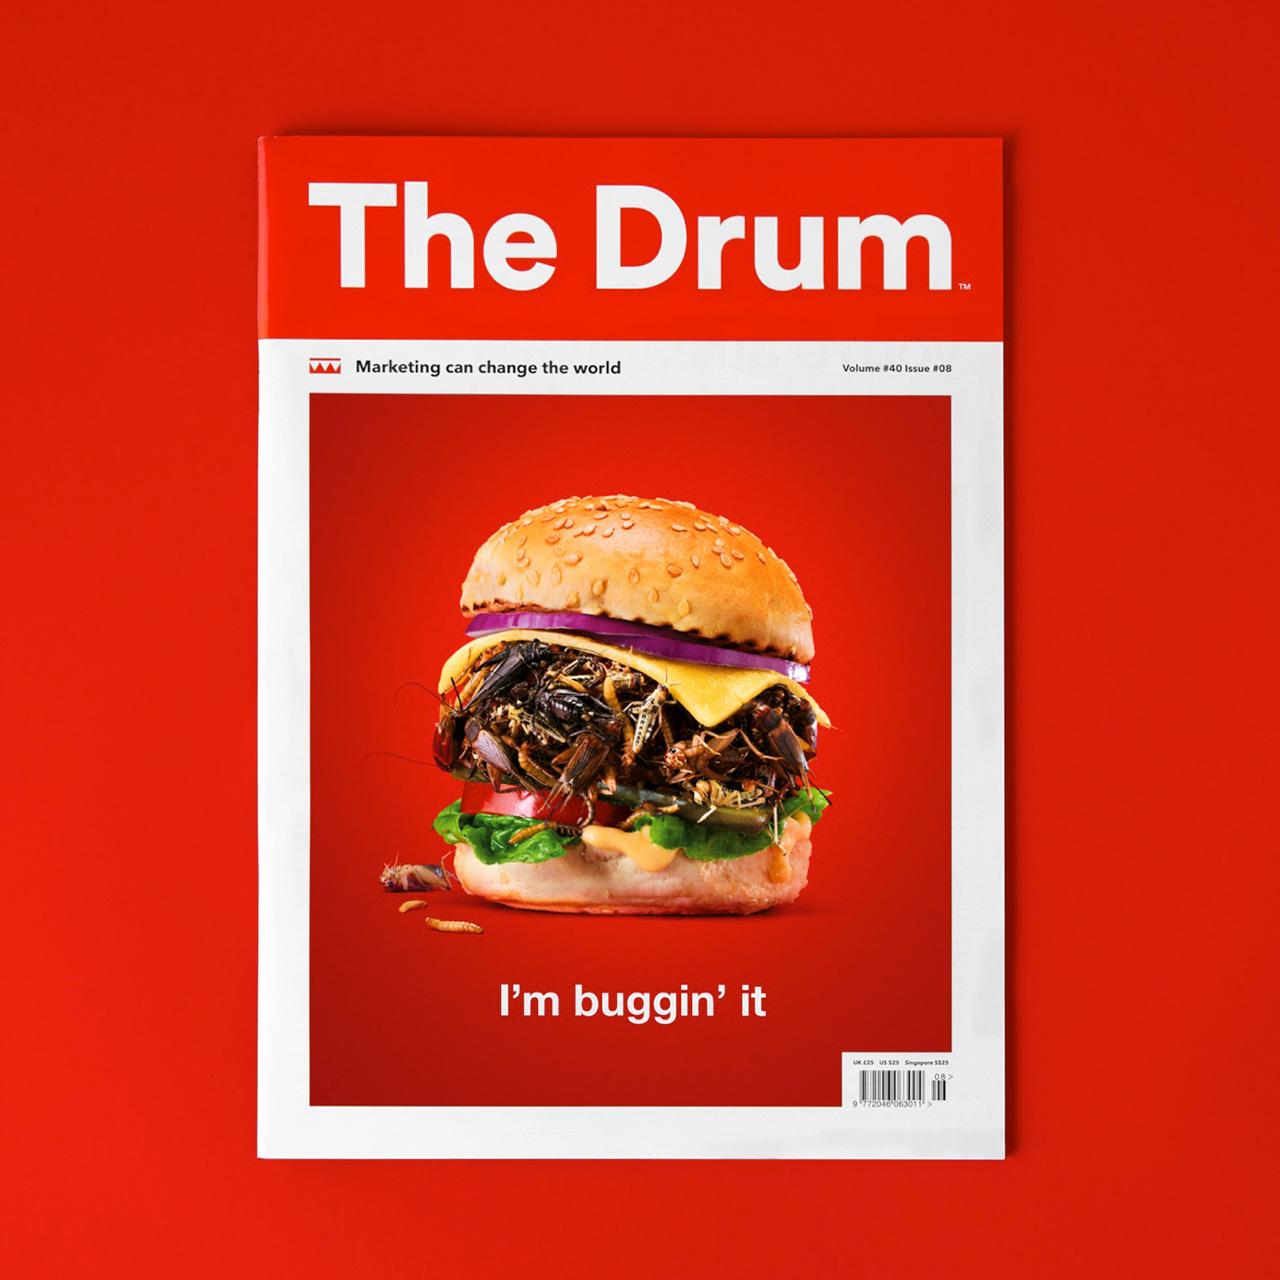 The Drum_2000x2000.jpg